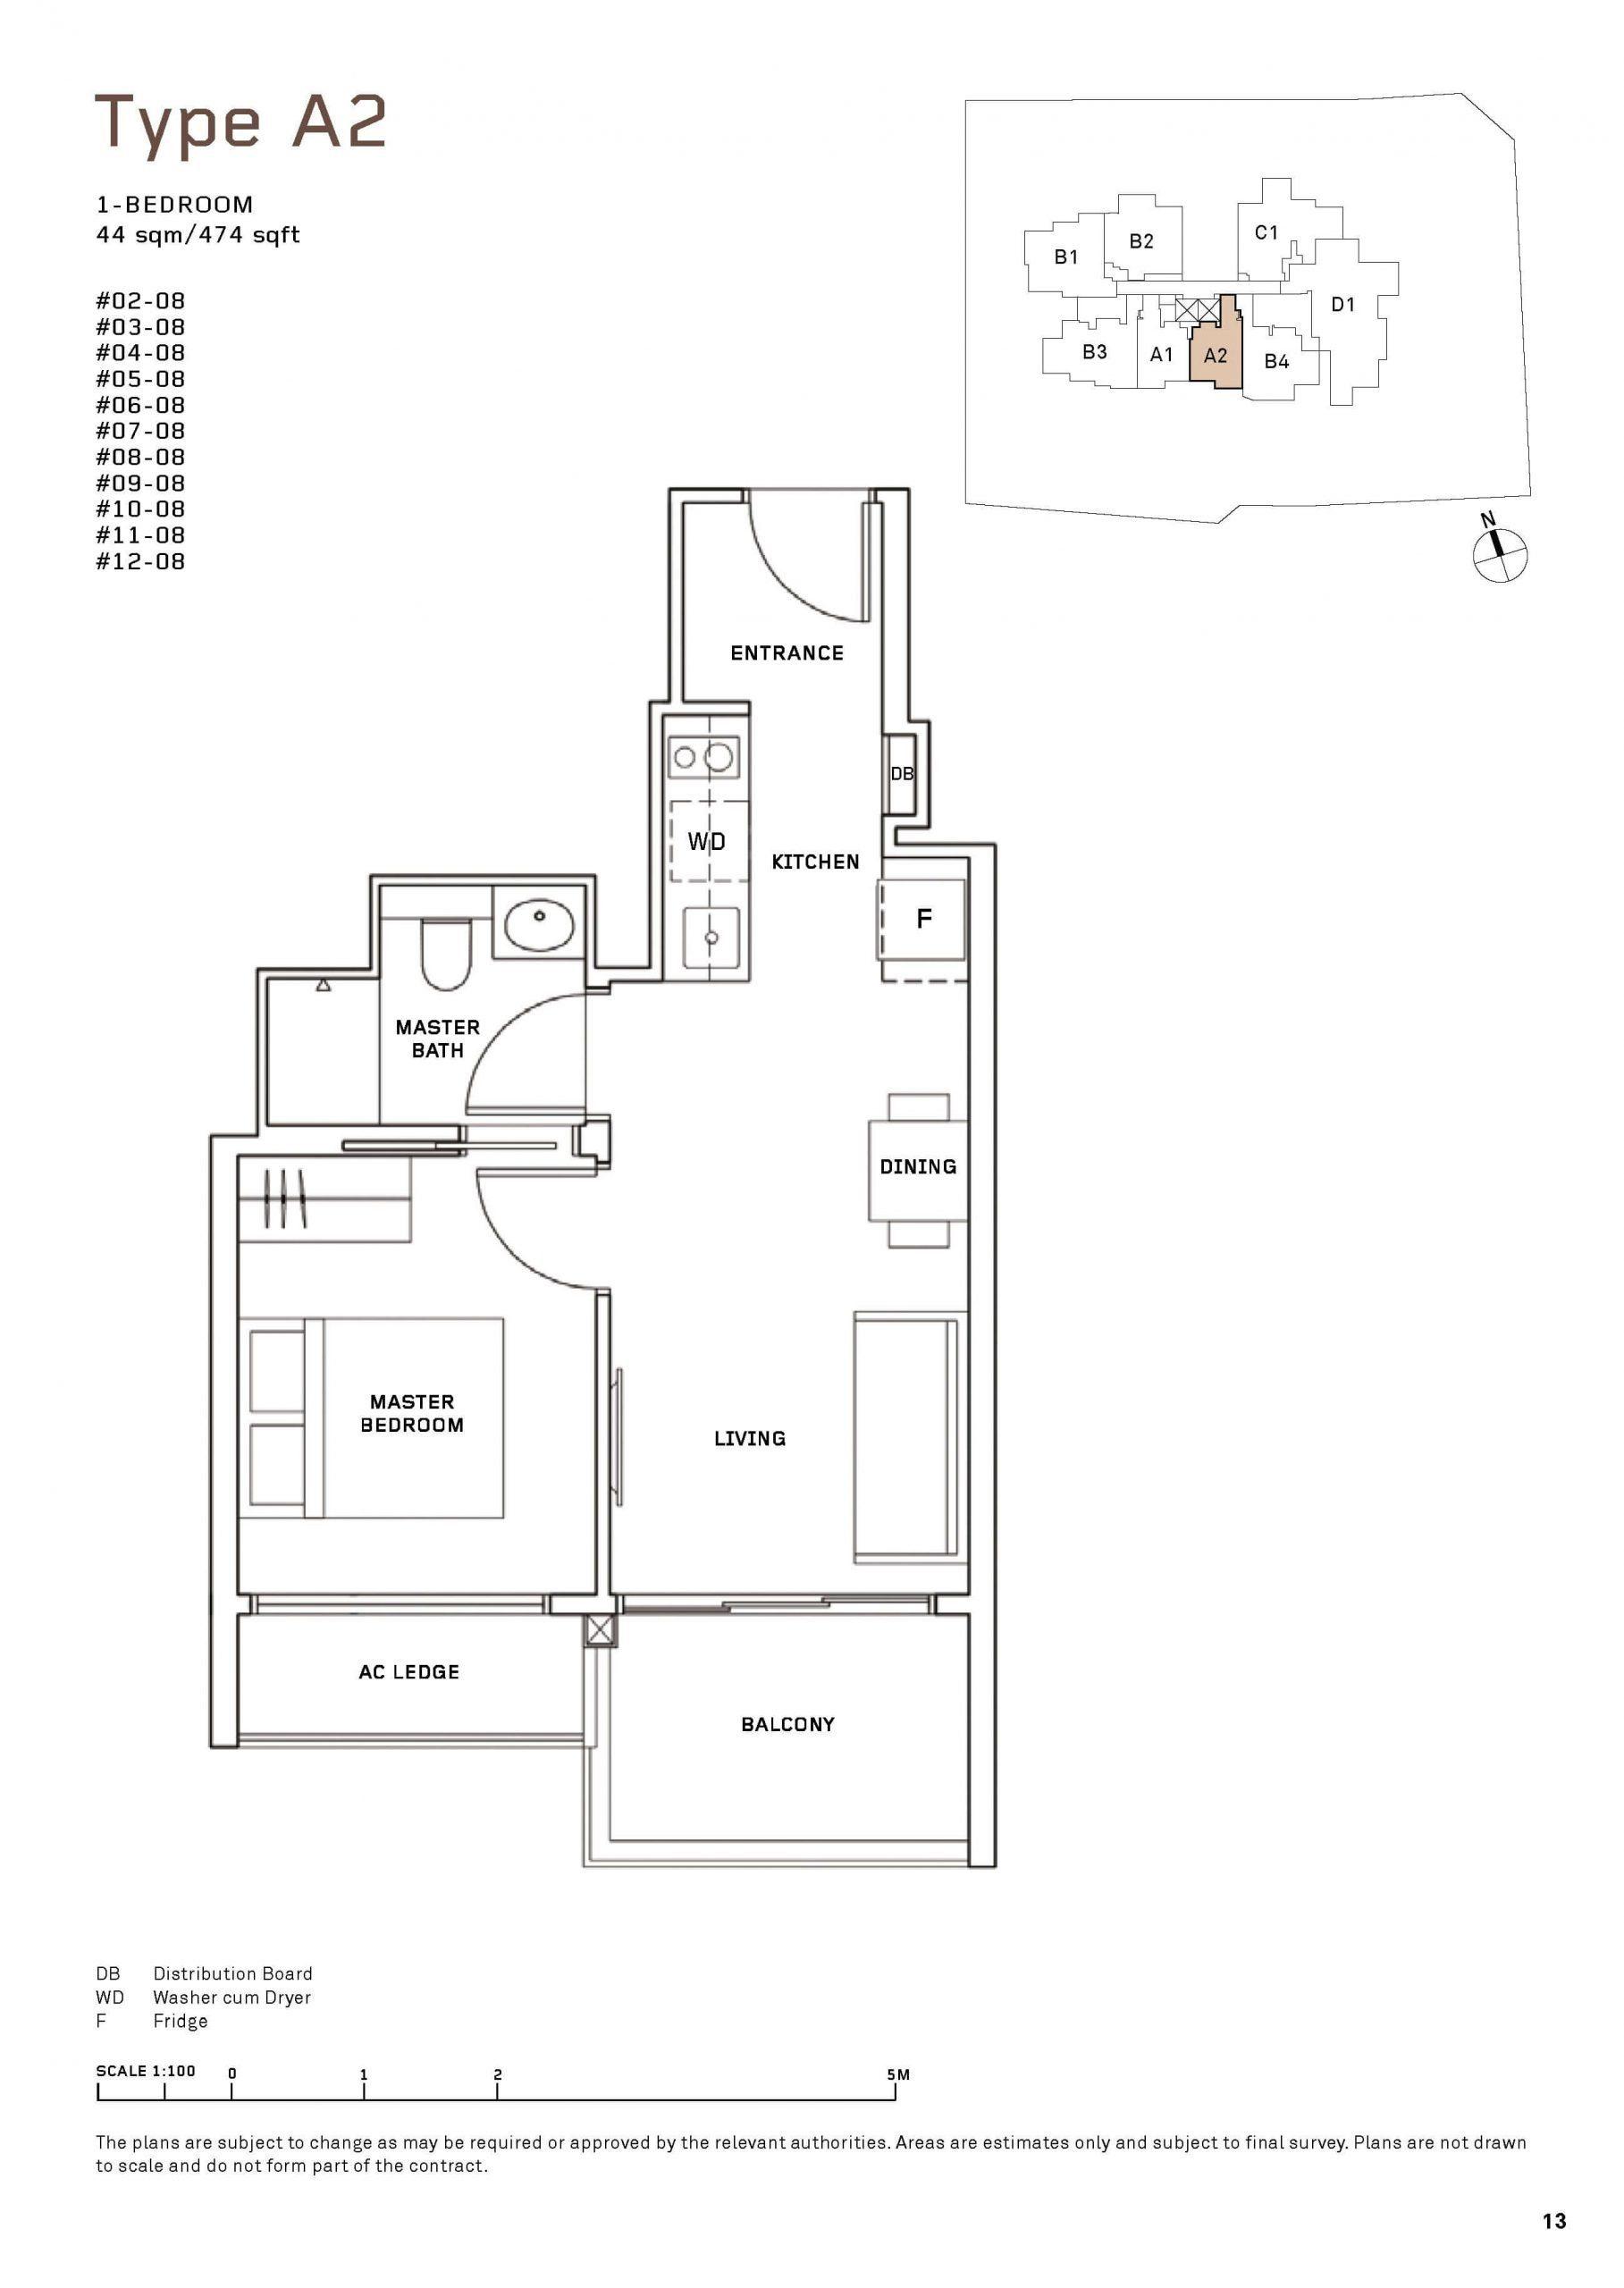 MYRA Condo Floor Plan 1 Bedroom 2 scaled